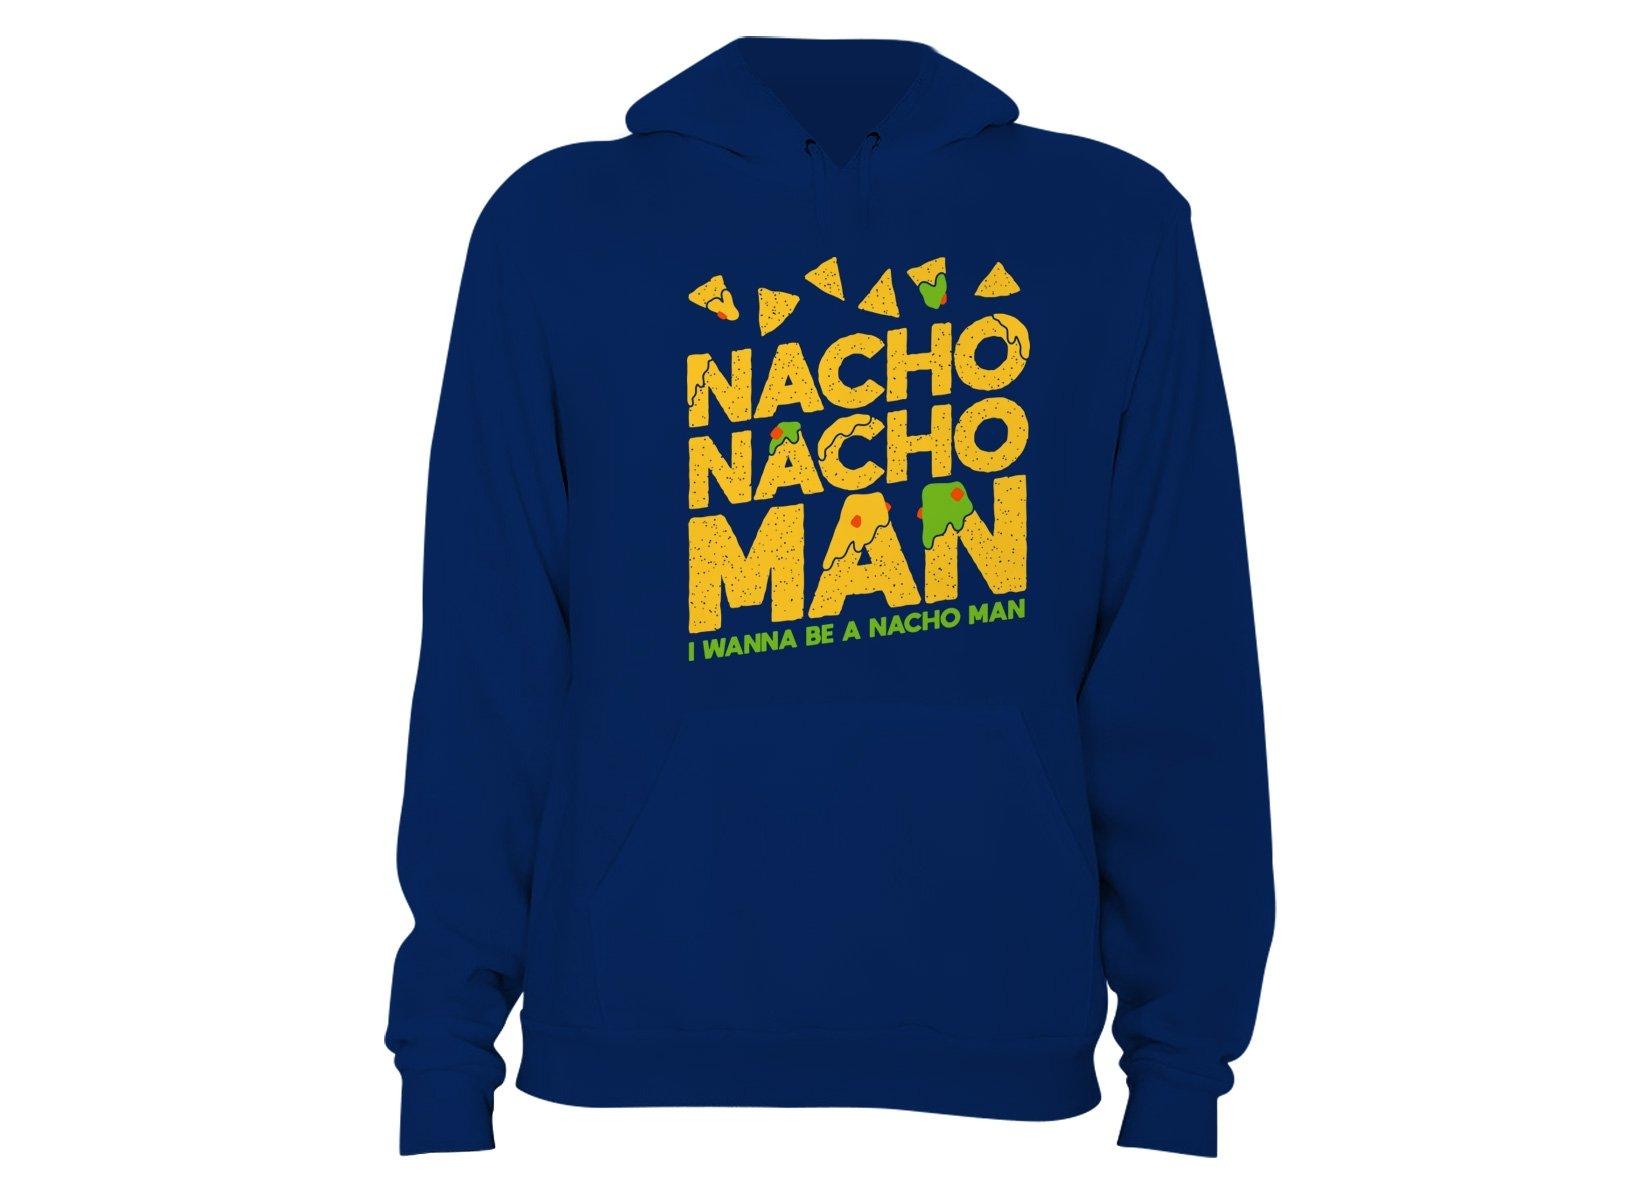 Nacho Nacho Man on Hoodie